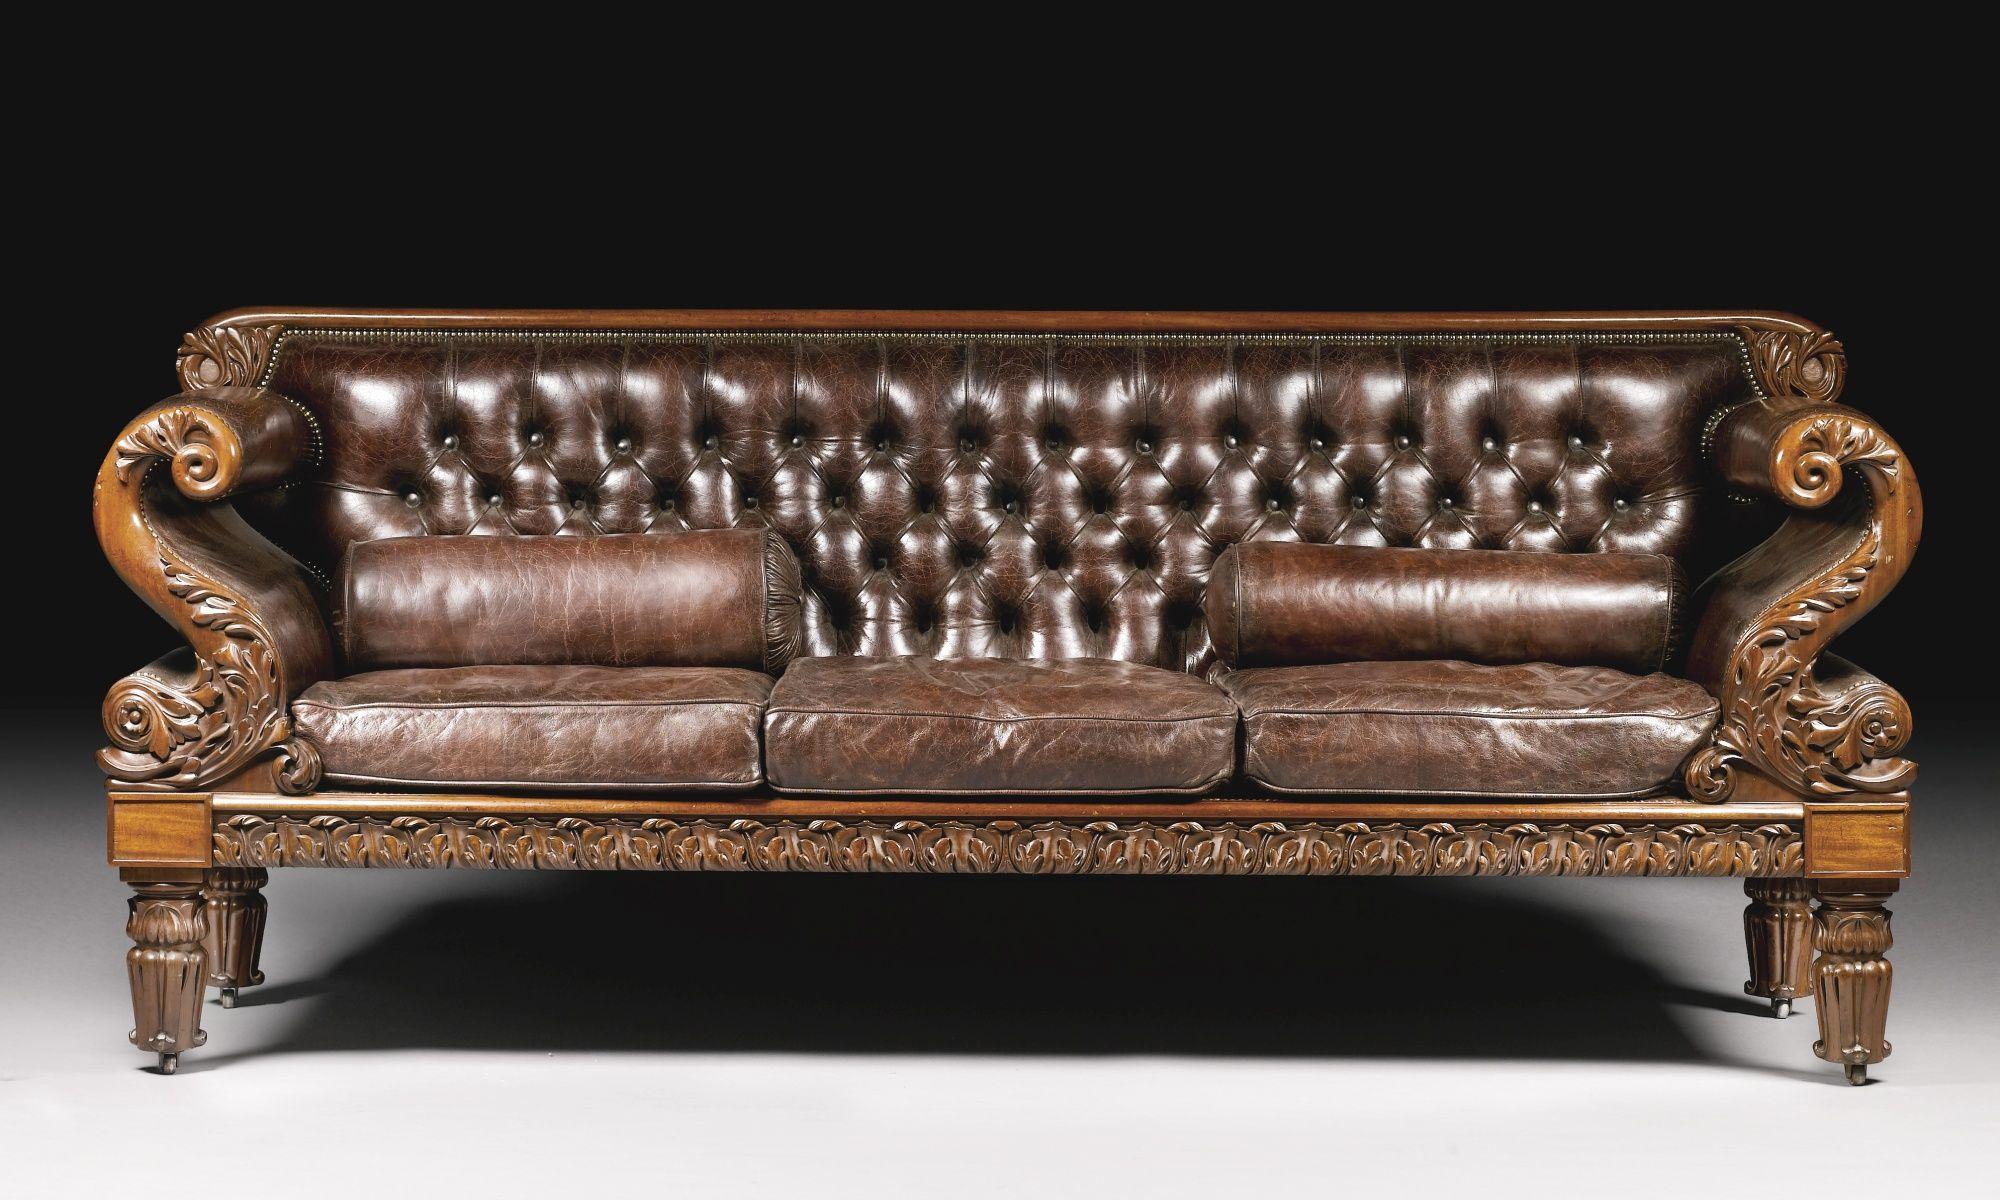 C1825 A George Iv Mahogany Three Seater Sofa Circa 1825 Estimate 7 000 10 000 Gbp 11 466 16 380usd Rococo Furniture Living Room Sofa Design Antique Sofa